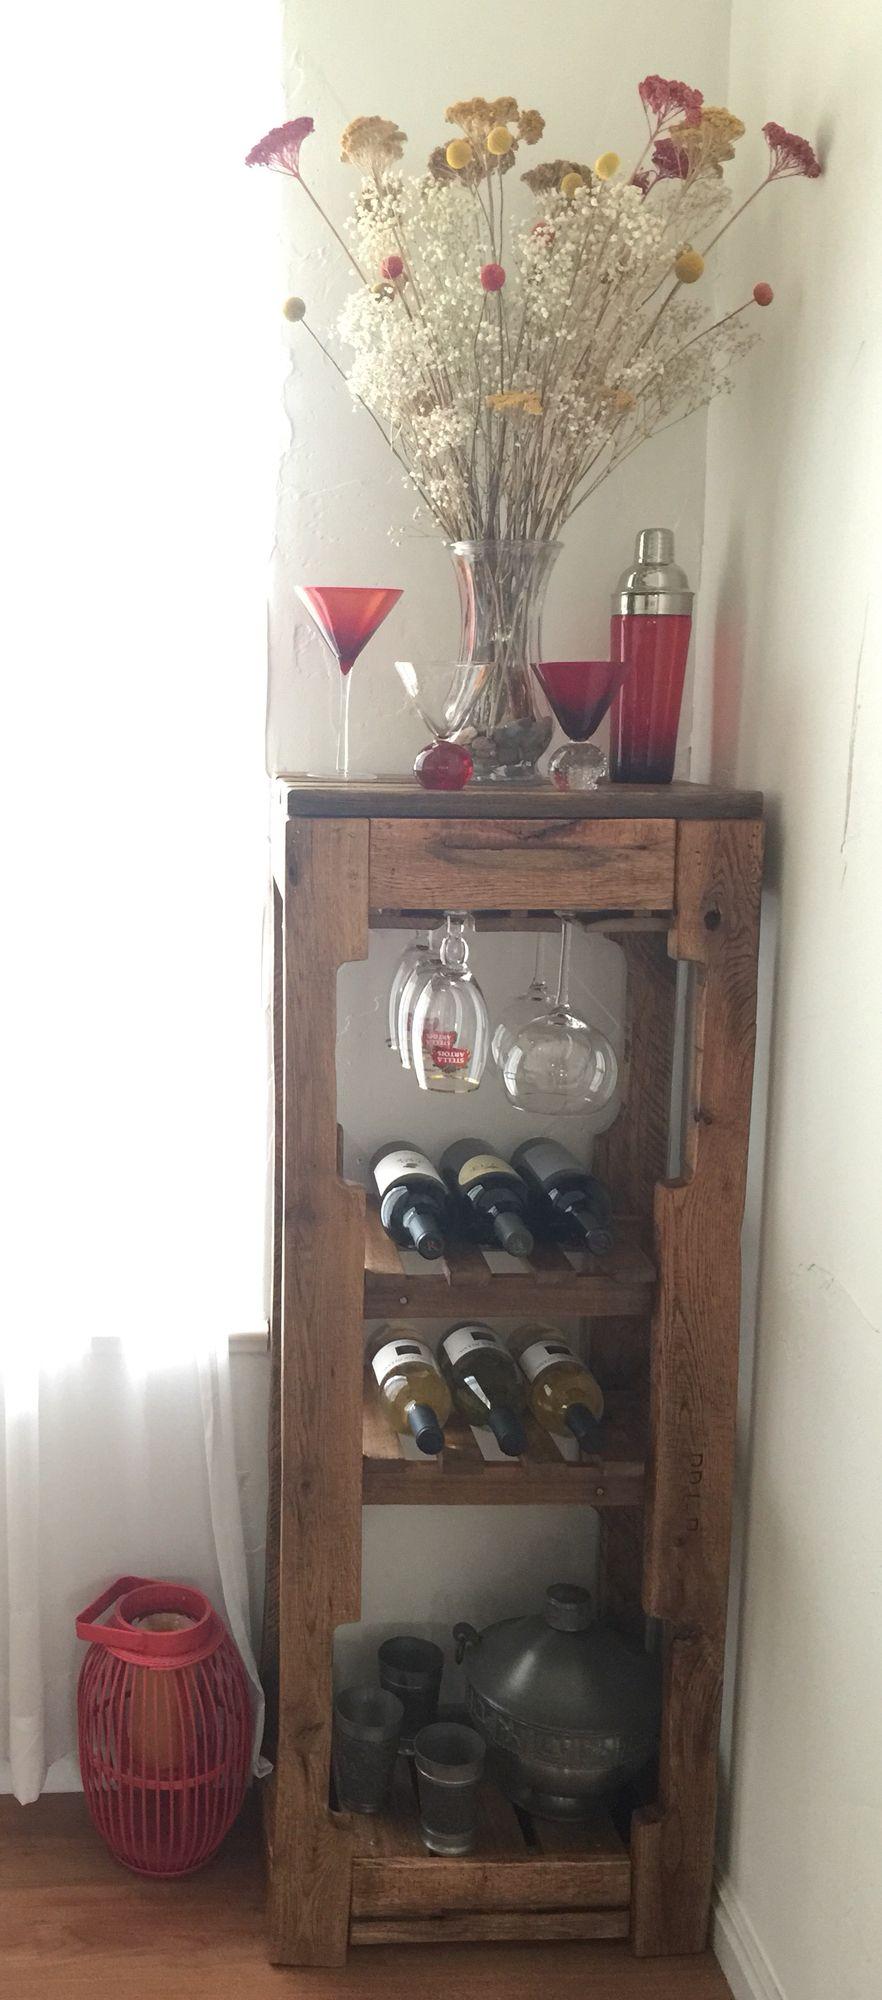 Hand crafted diy pallet wood wine rack shelves hanging